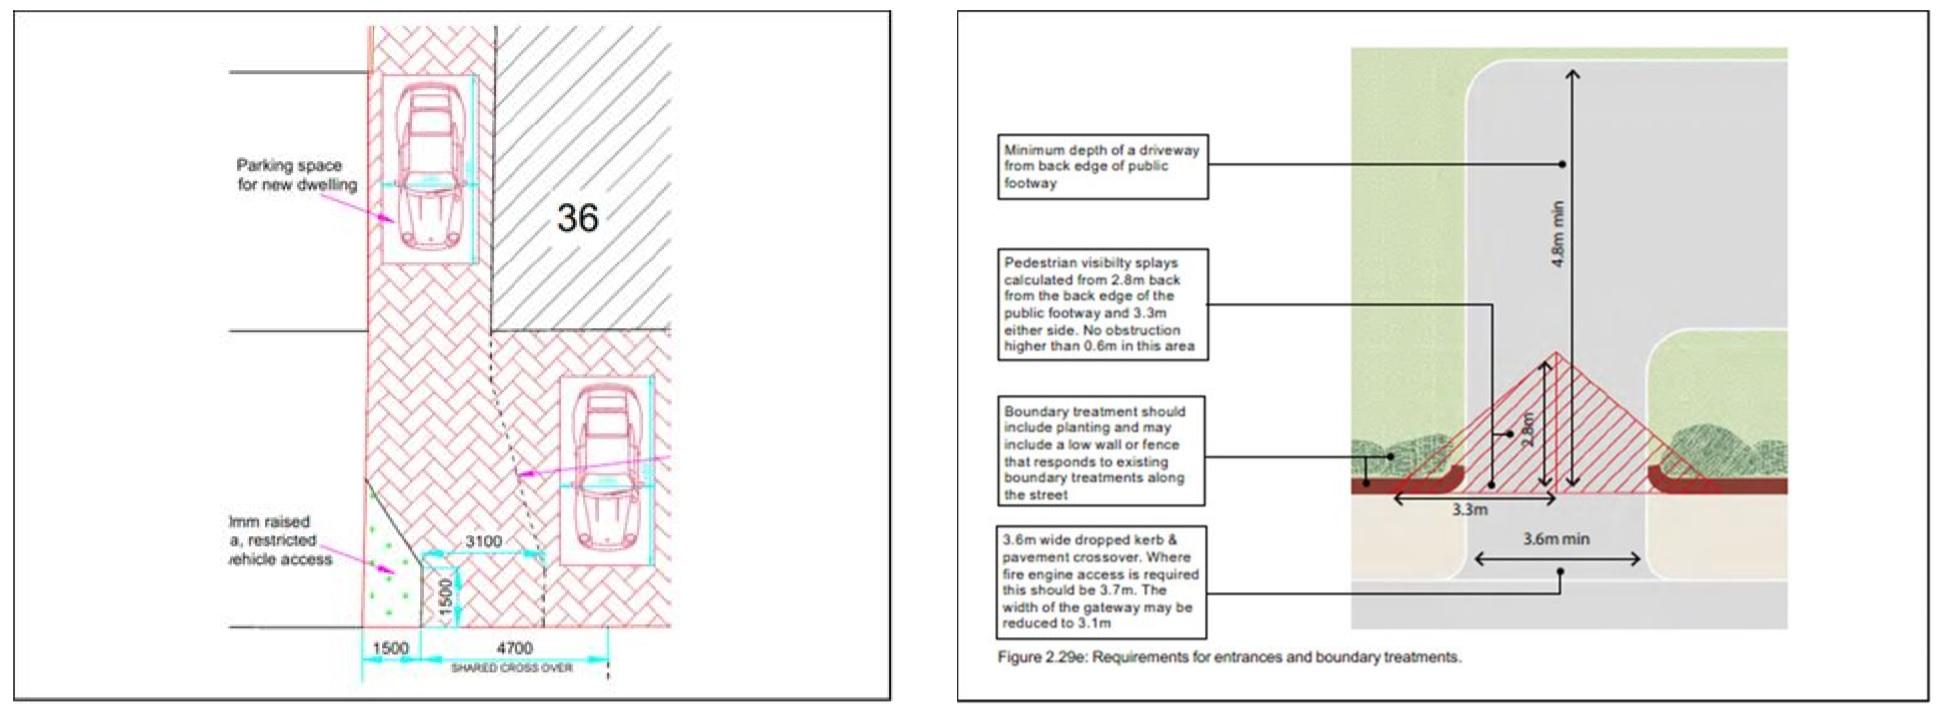 2001 Chevy Suburban Wiring Diagram Further Worksheet Verb Grade 2